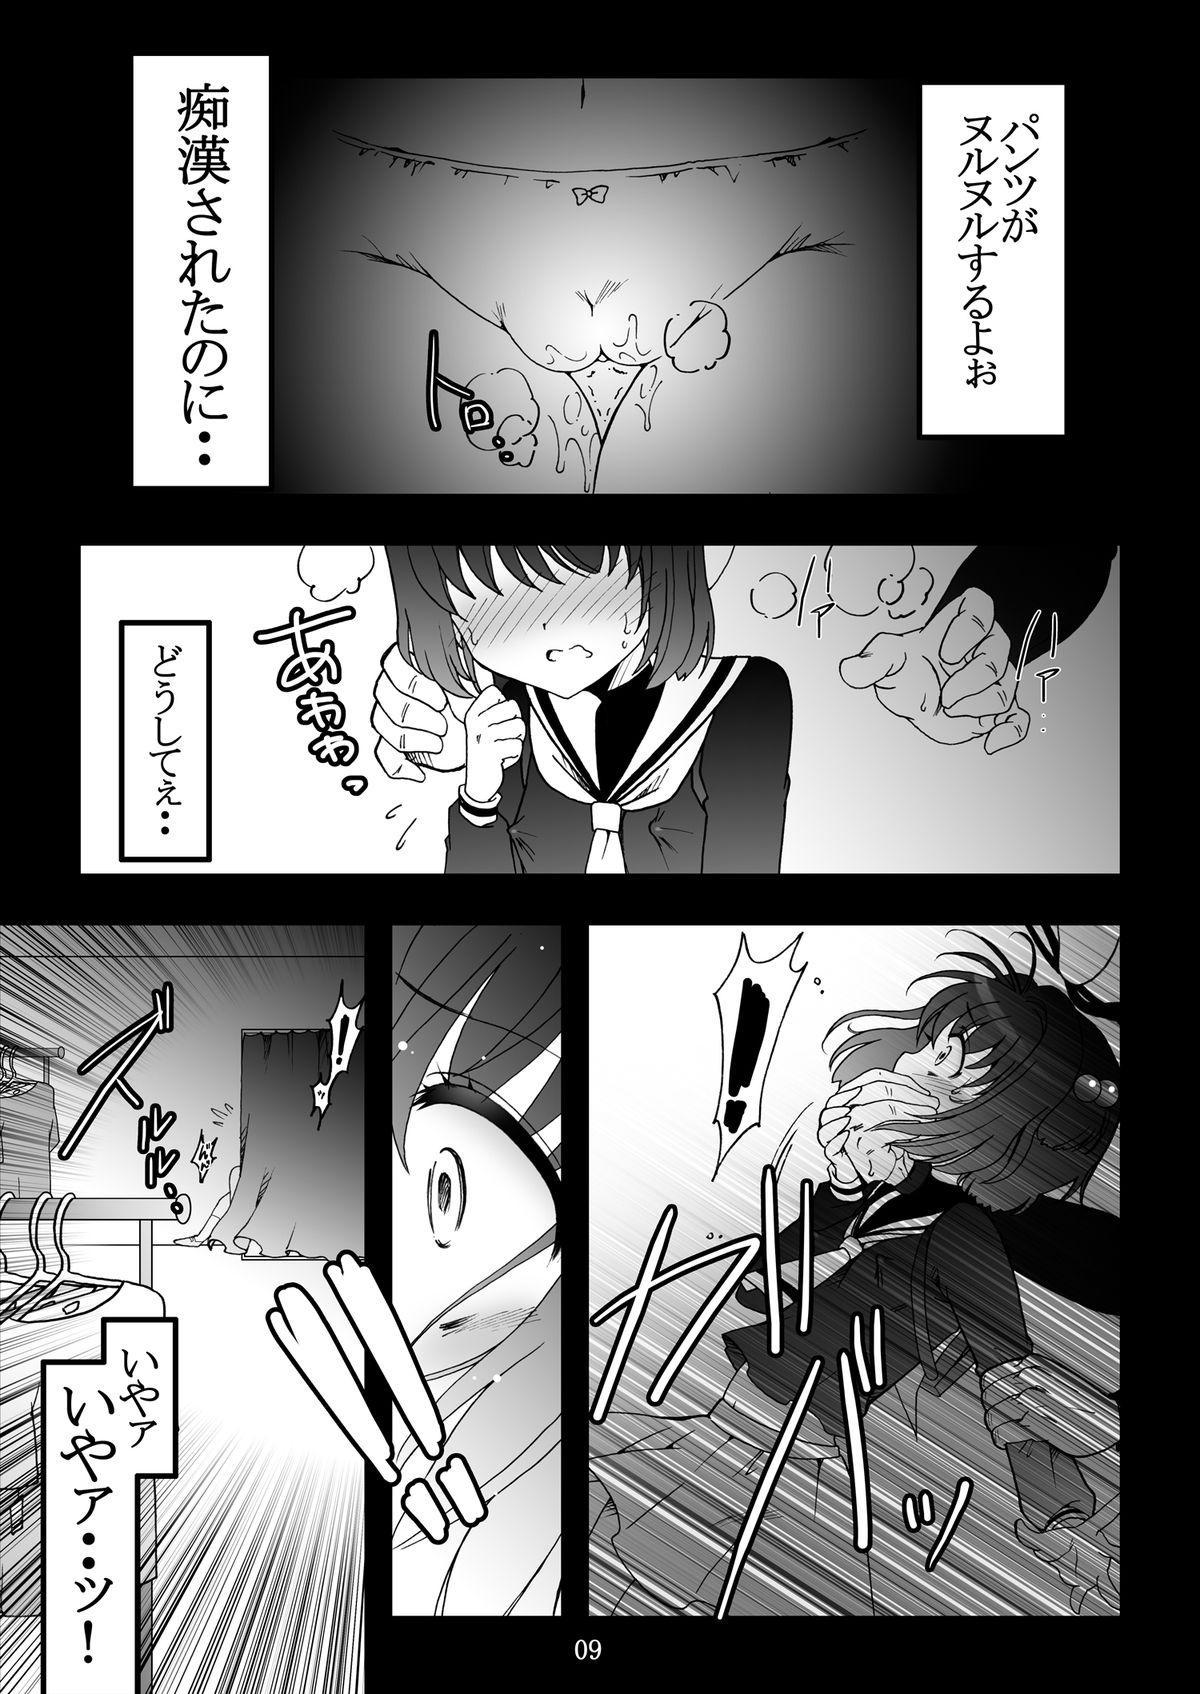 Sakura Slave to the Grind 8